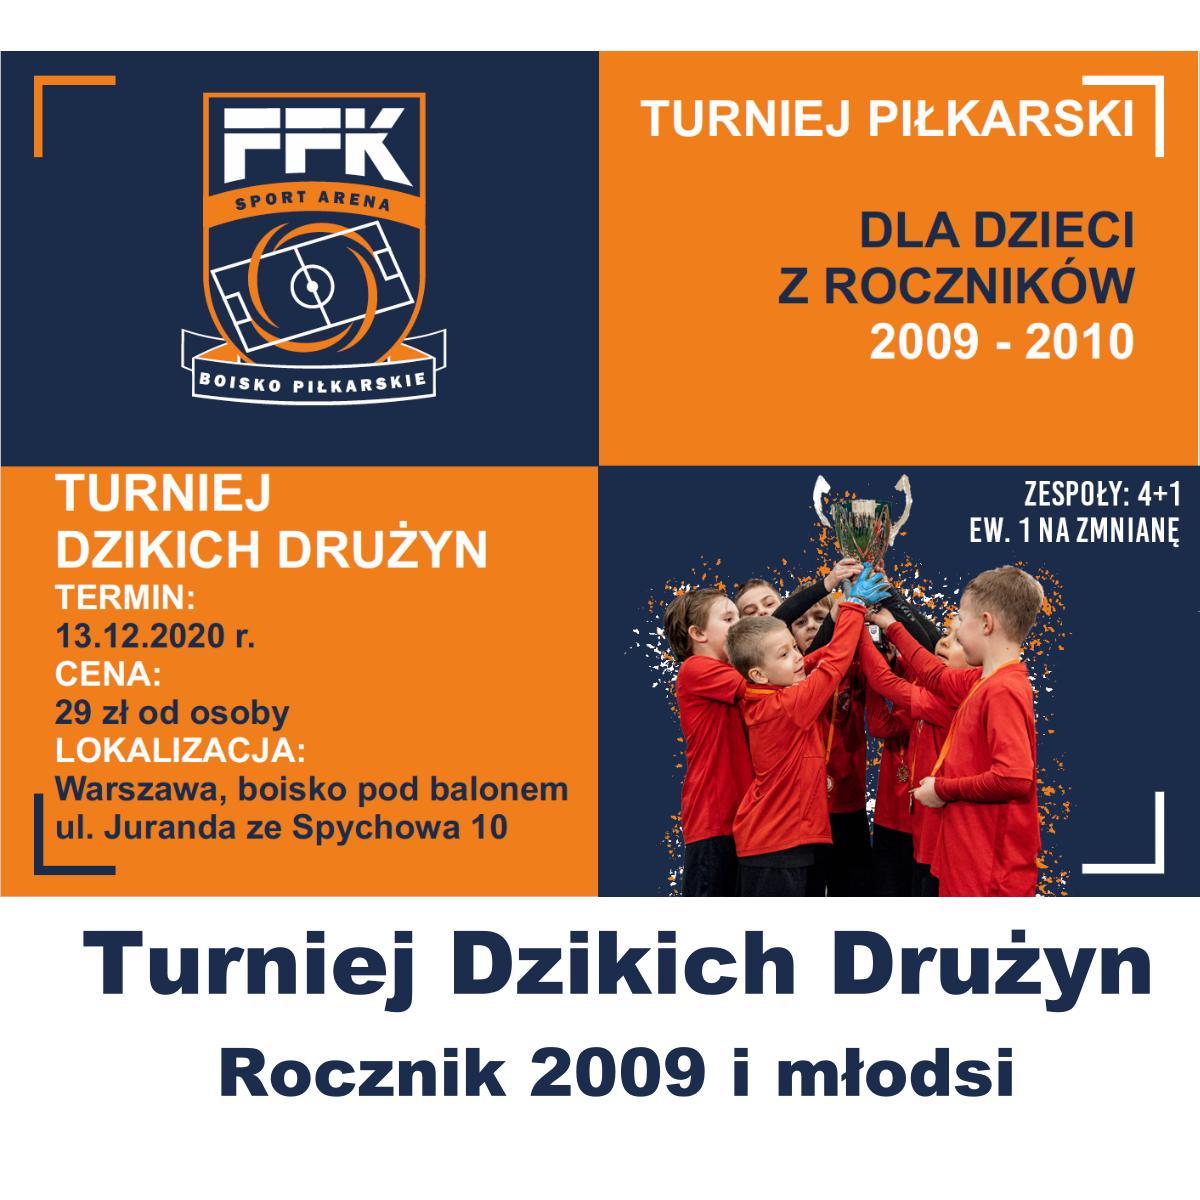 https://ffksport.pl/wp-content/uploads/2020/12/Turniej-200910.png